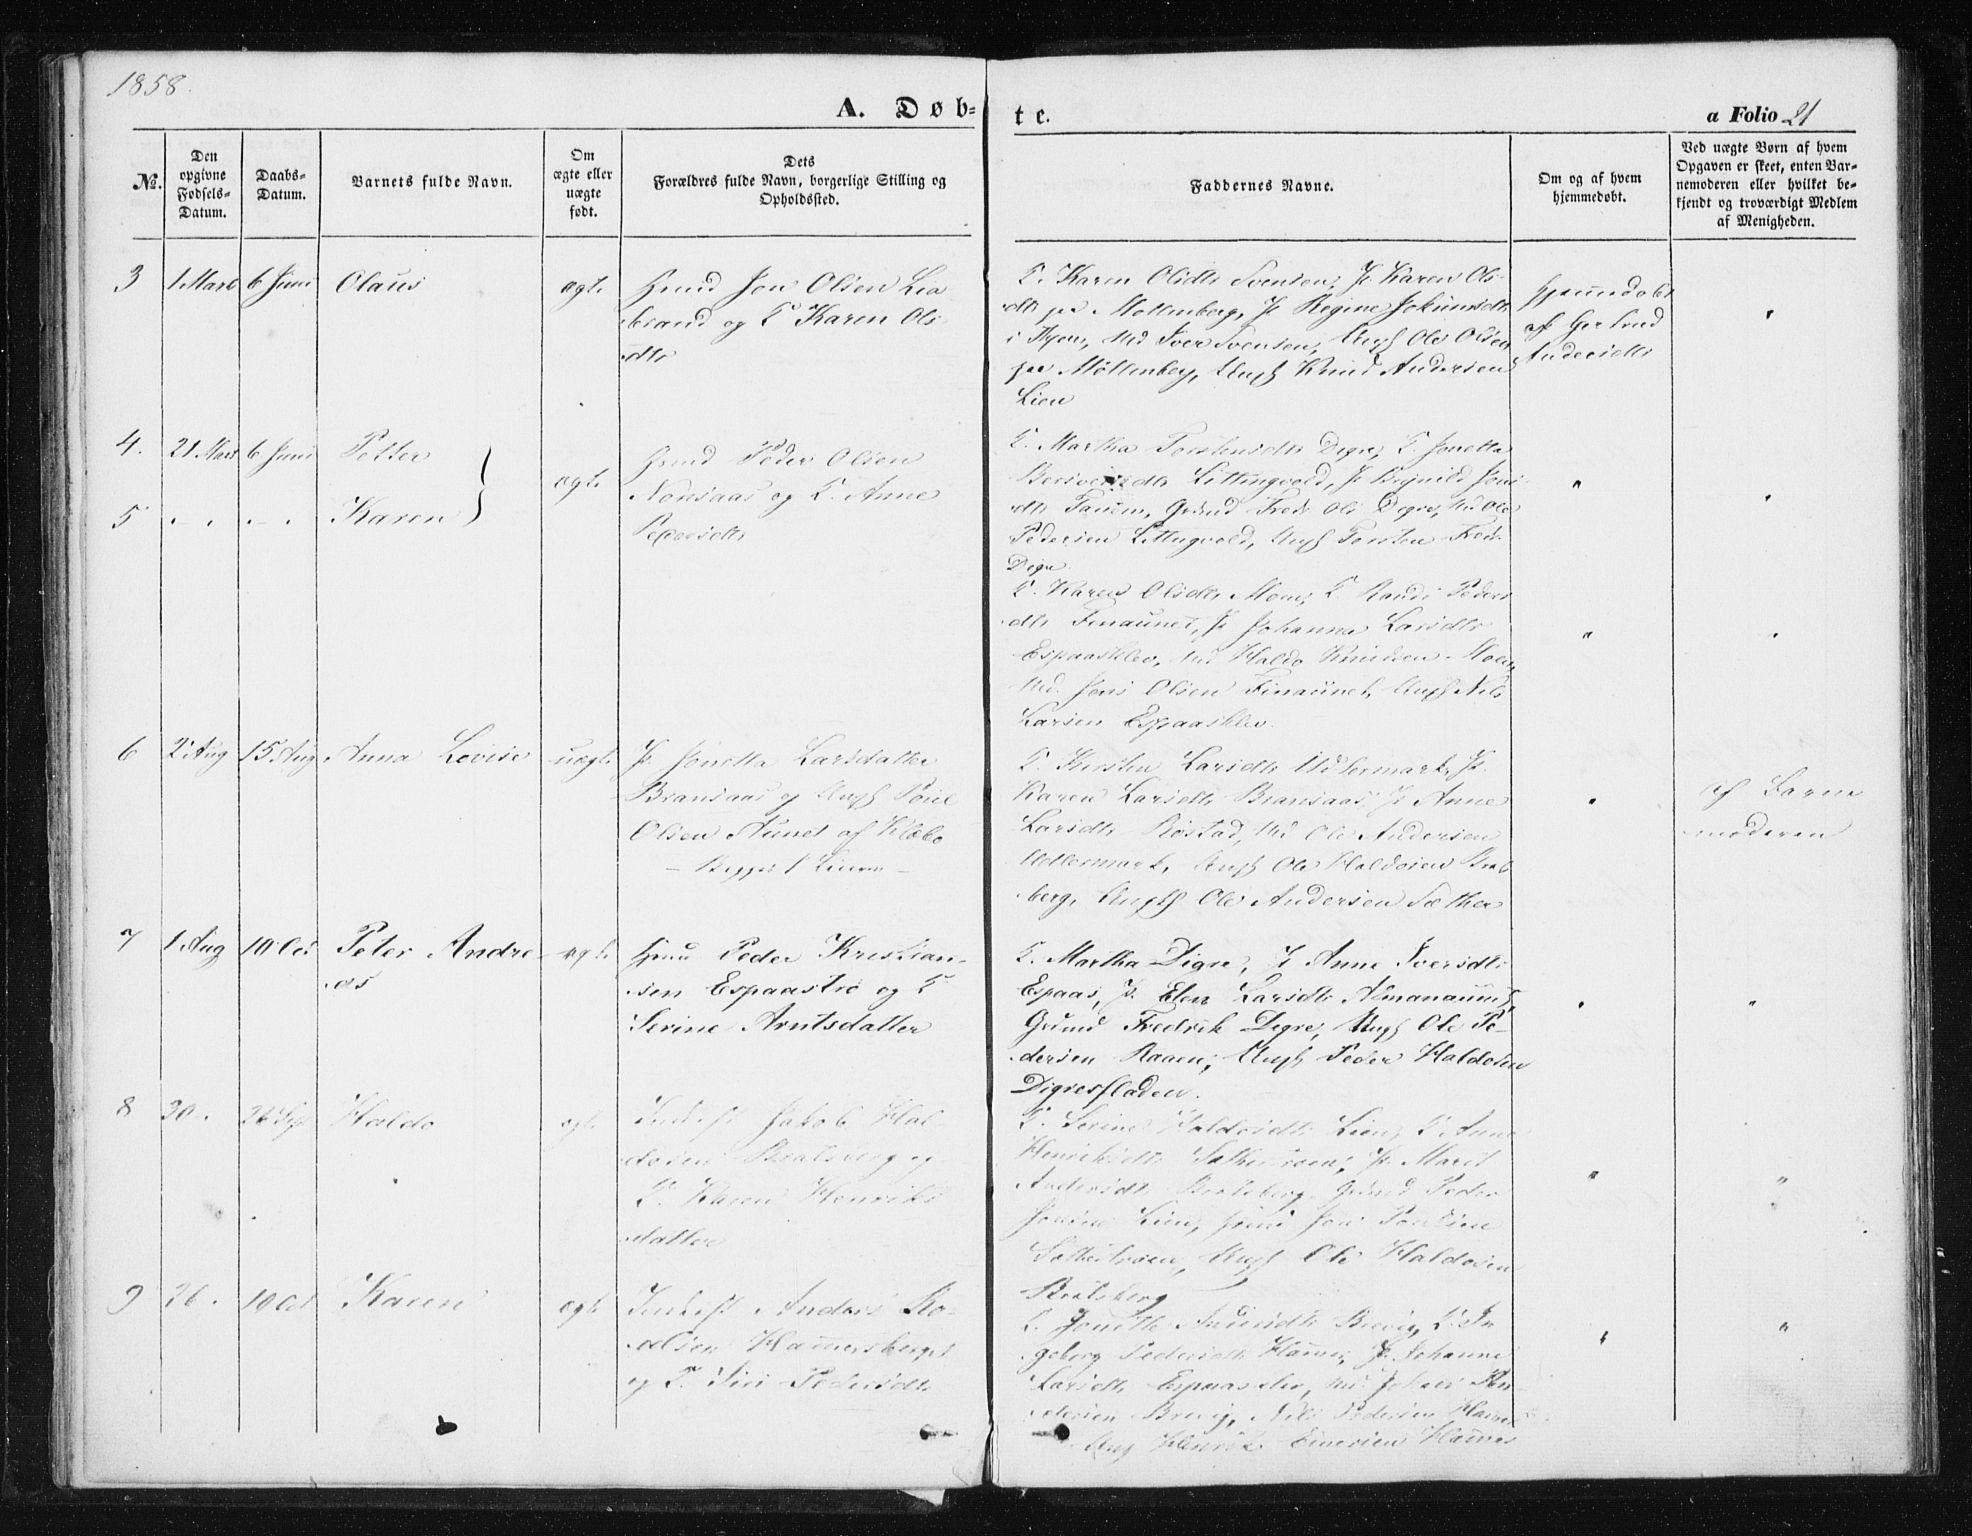 SAT, Ministerialprotokoller, klokkerbøker og fødselsregistre - Sør-Trøndelag, 608/L0332: Parish register (official) no. 608A01, 1848-1861, p. 21